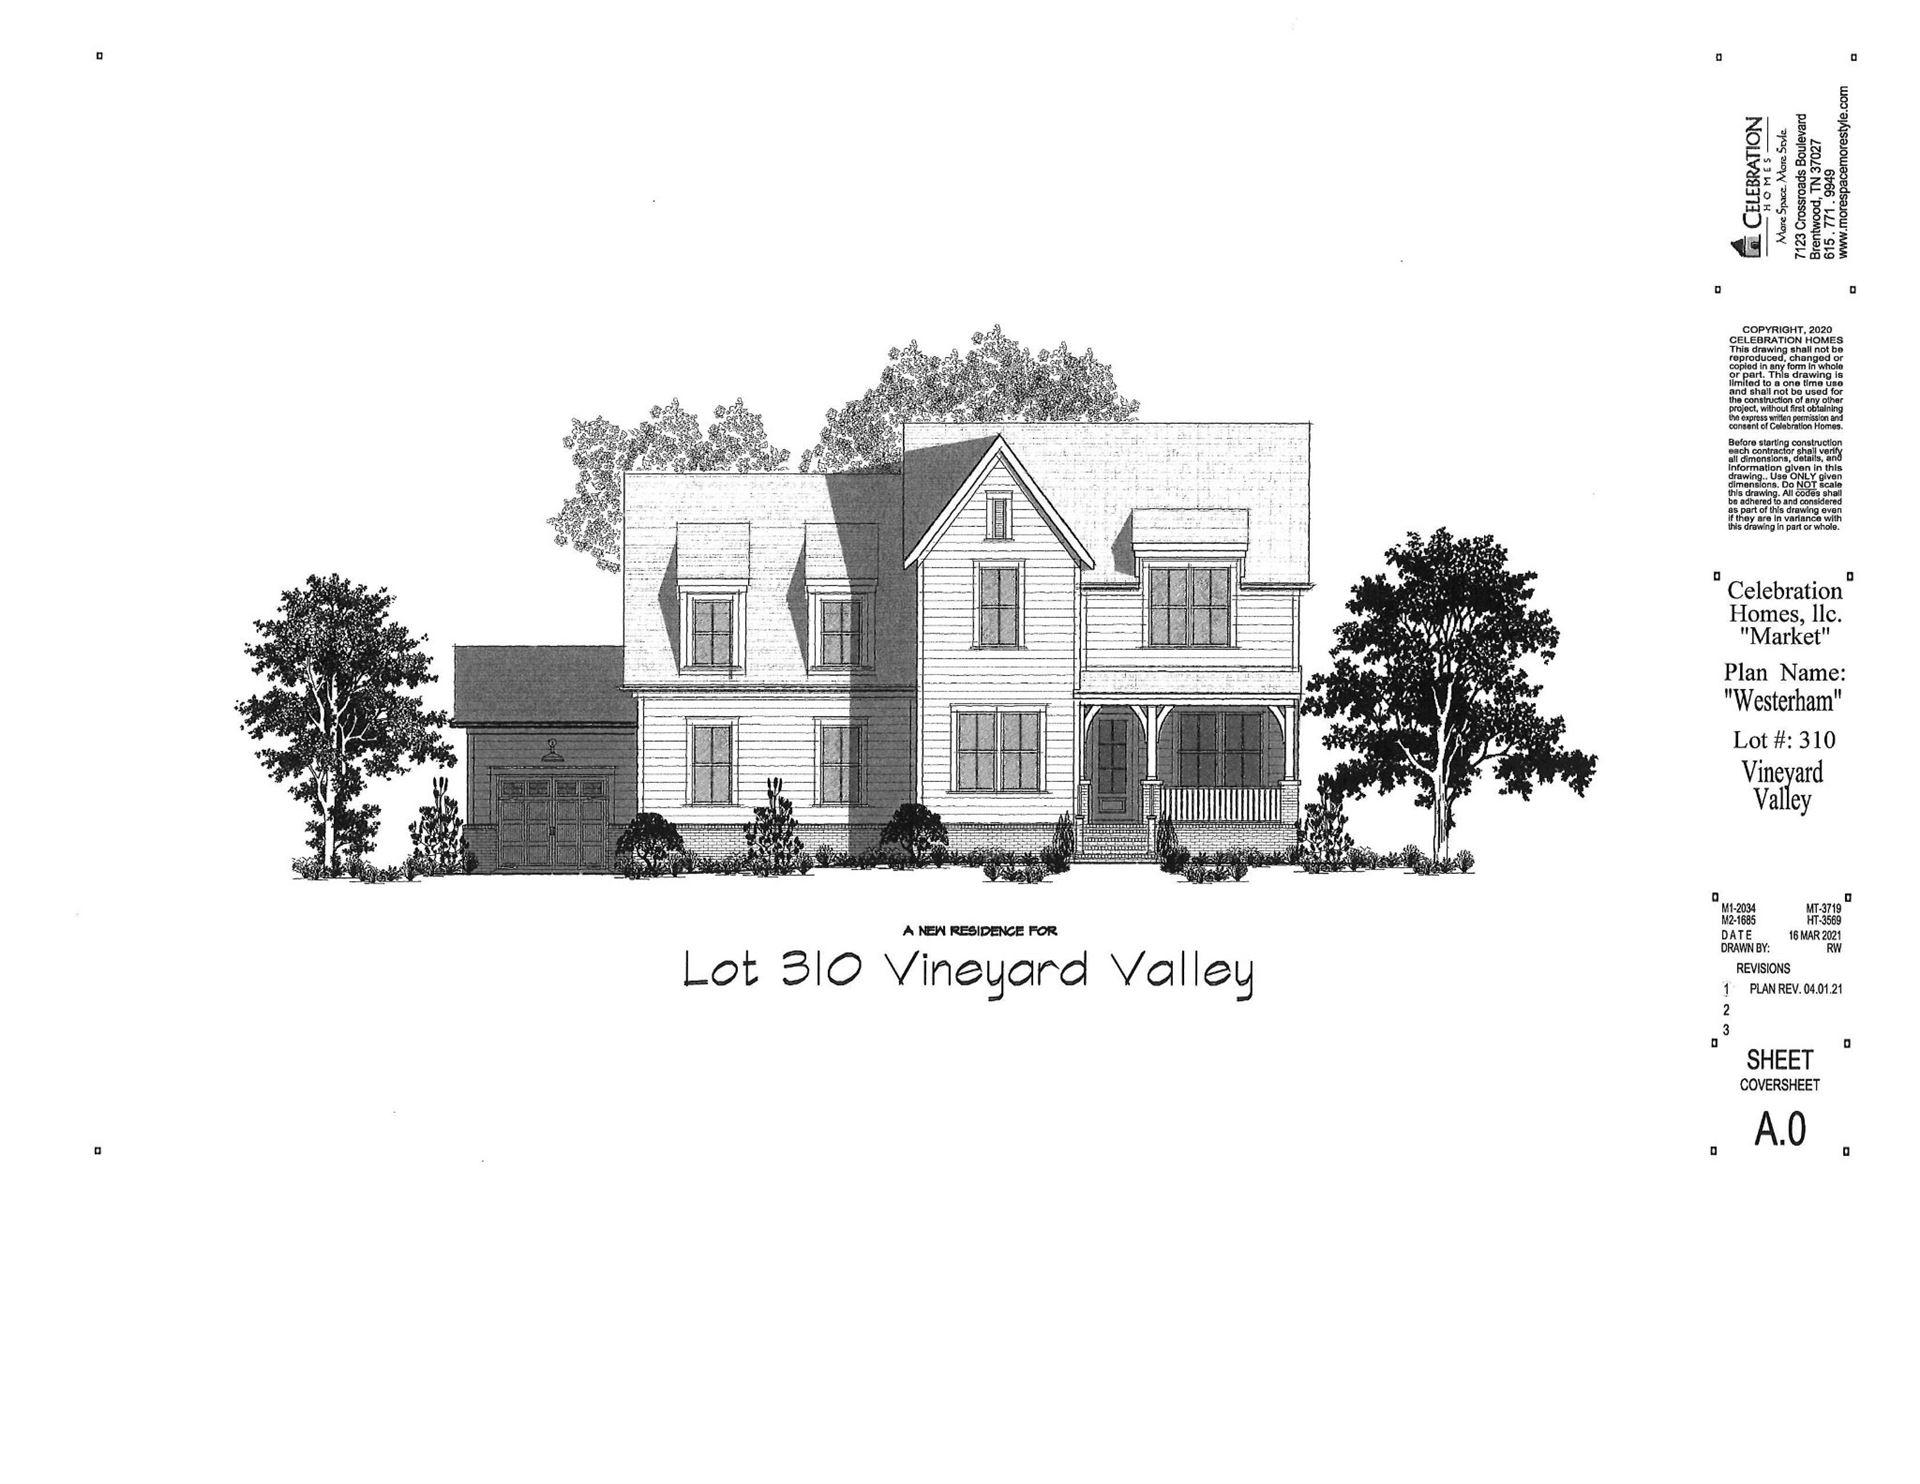 7101 Neills Branch Dr, College Grove, TN 37046 - MLS#: 2299109